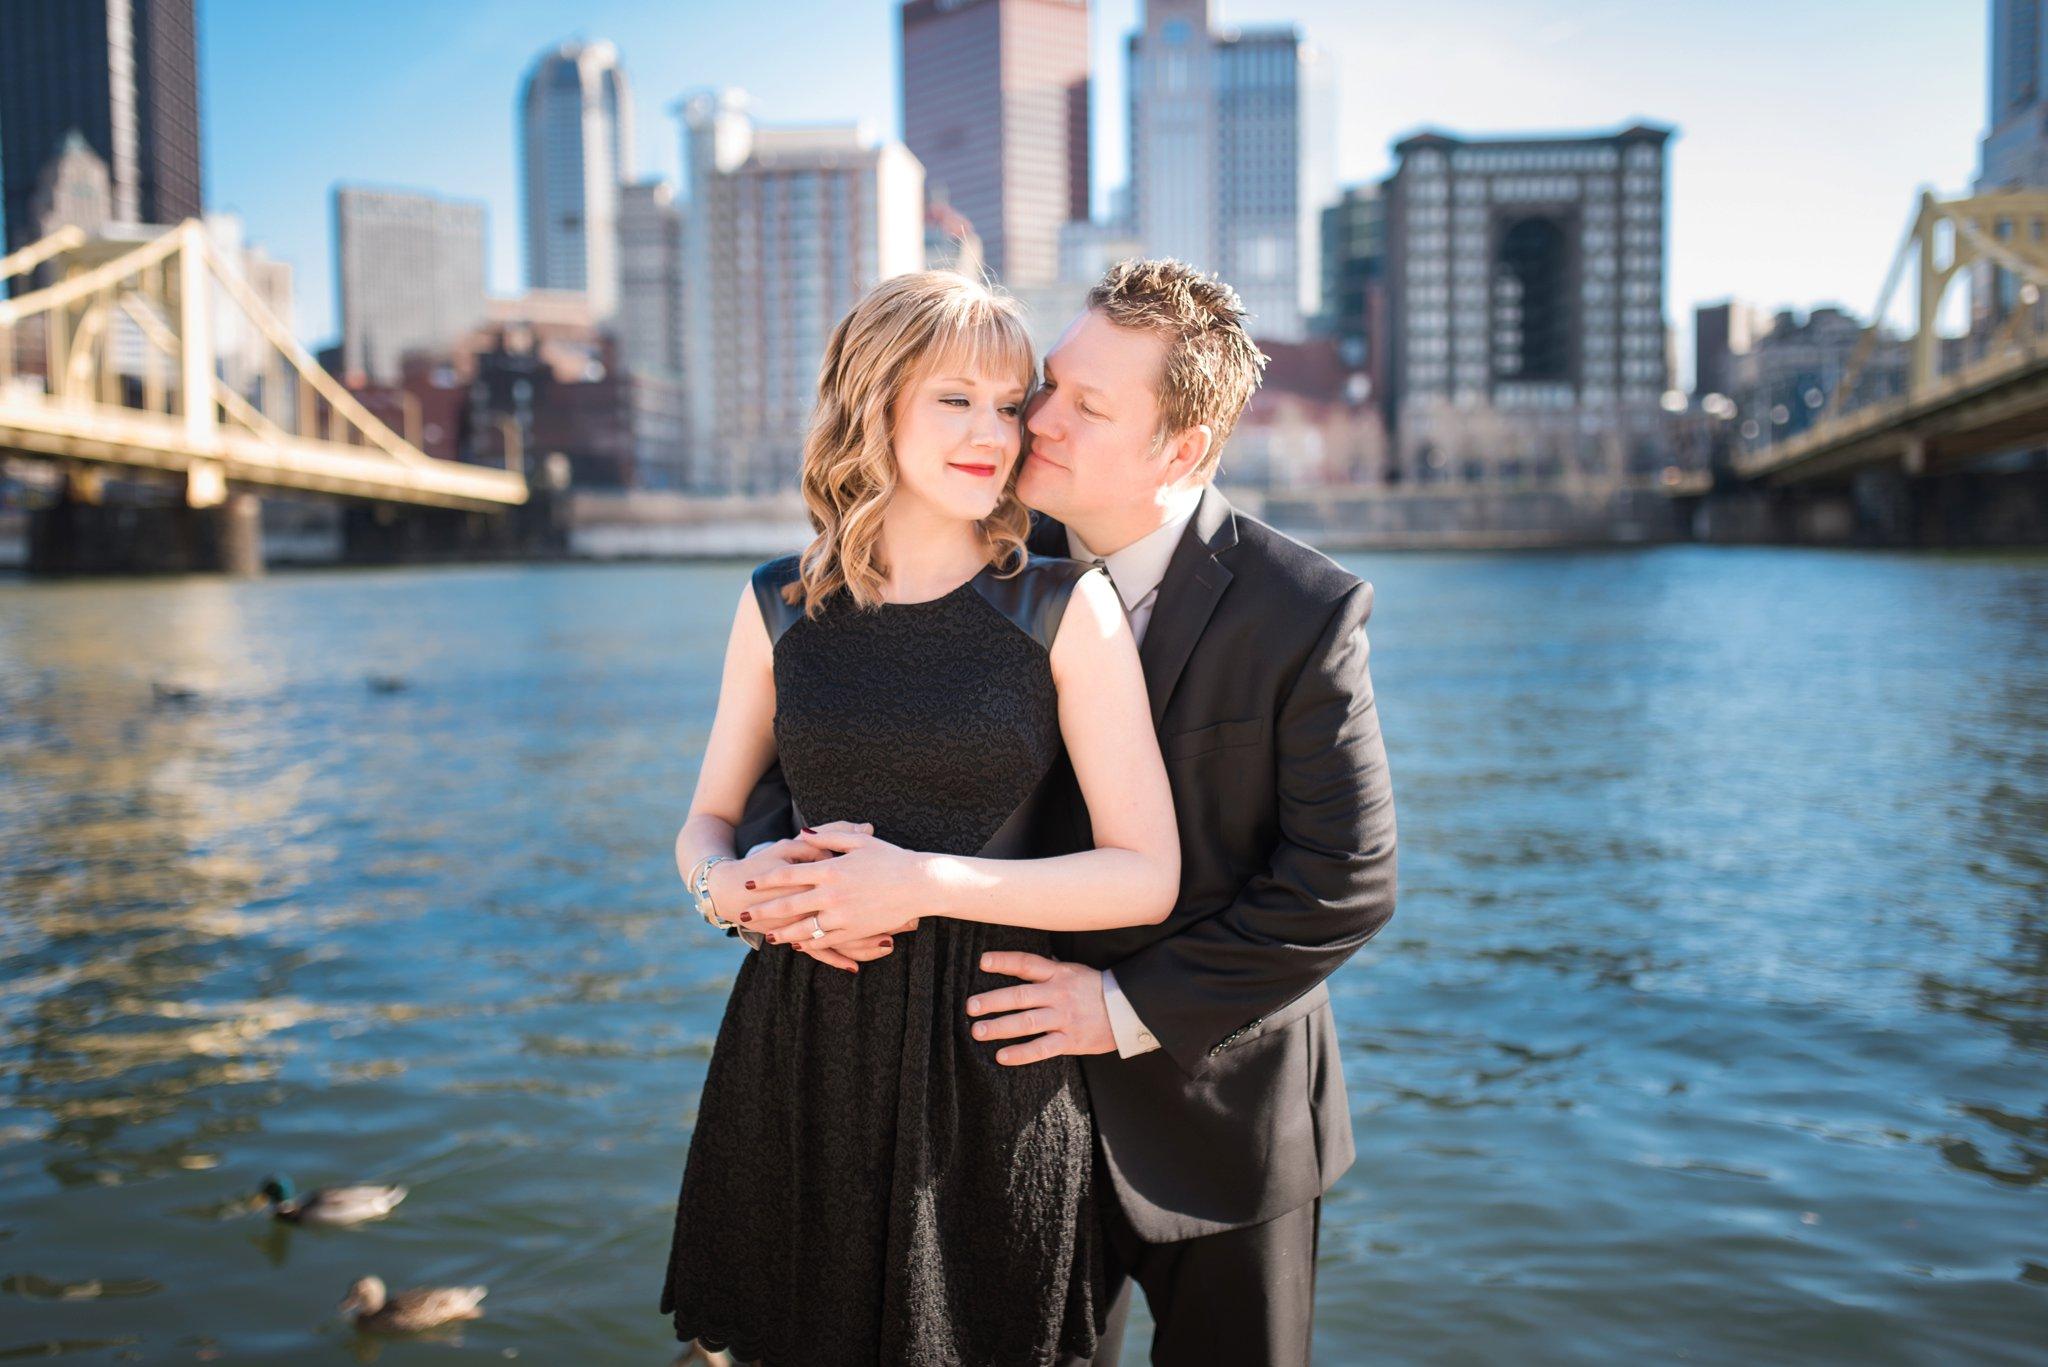 BP_NorthShore_Pittsburgh_Engagement_0016.jpg